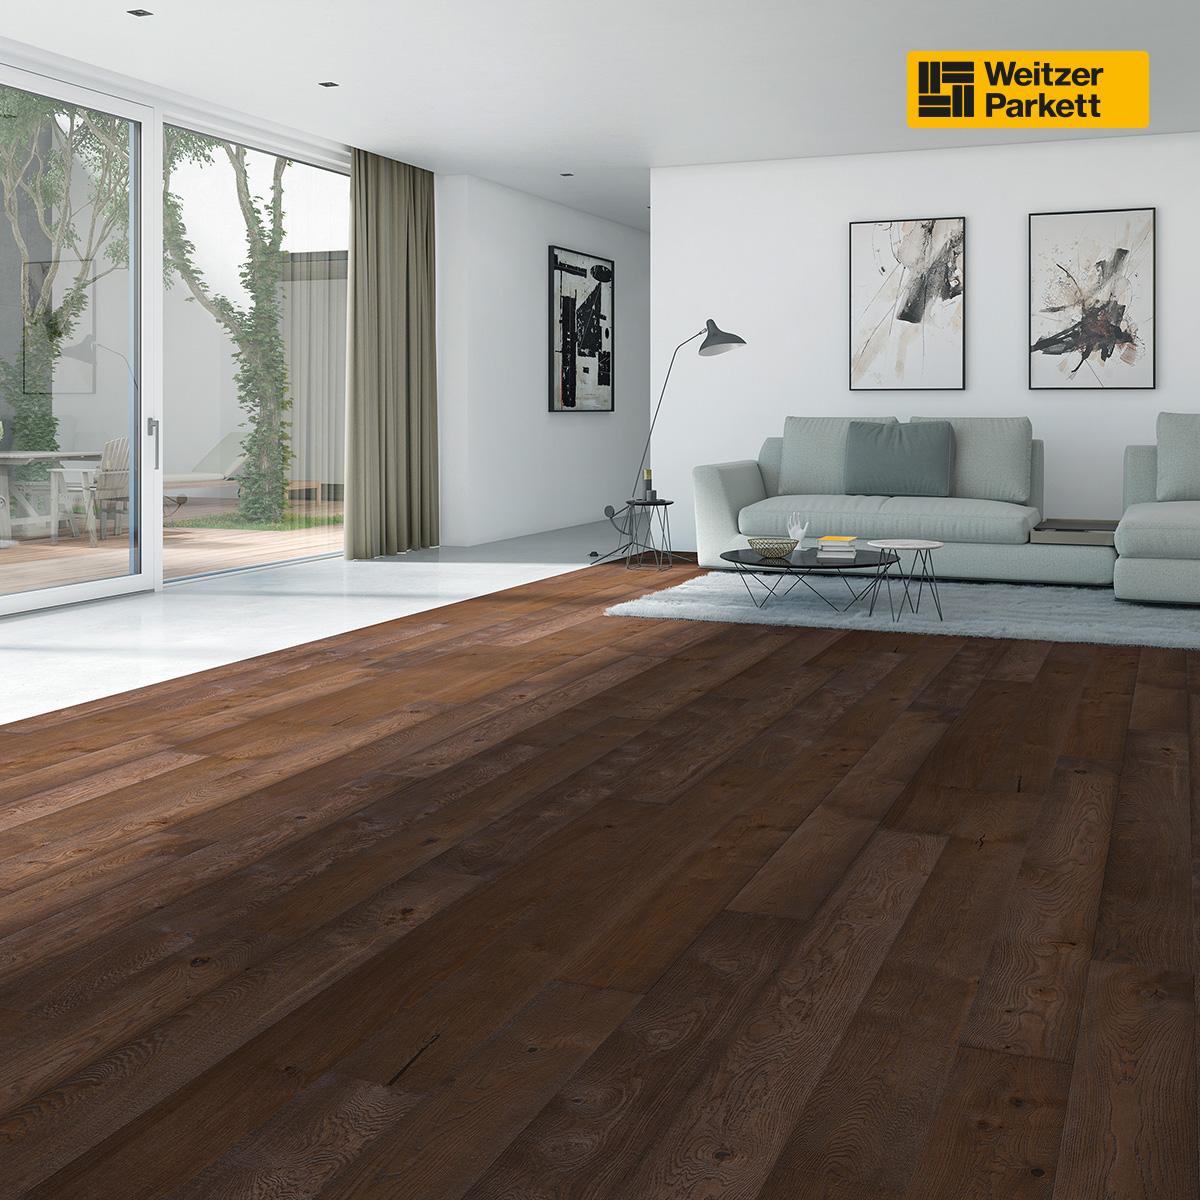 Plank-Appearance_WP_Charisma_EB_OAK_Cognac_wild_livingroom.jpg